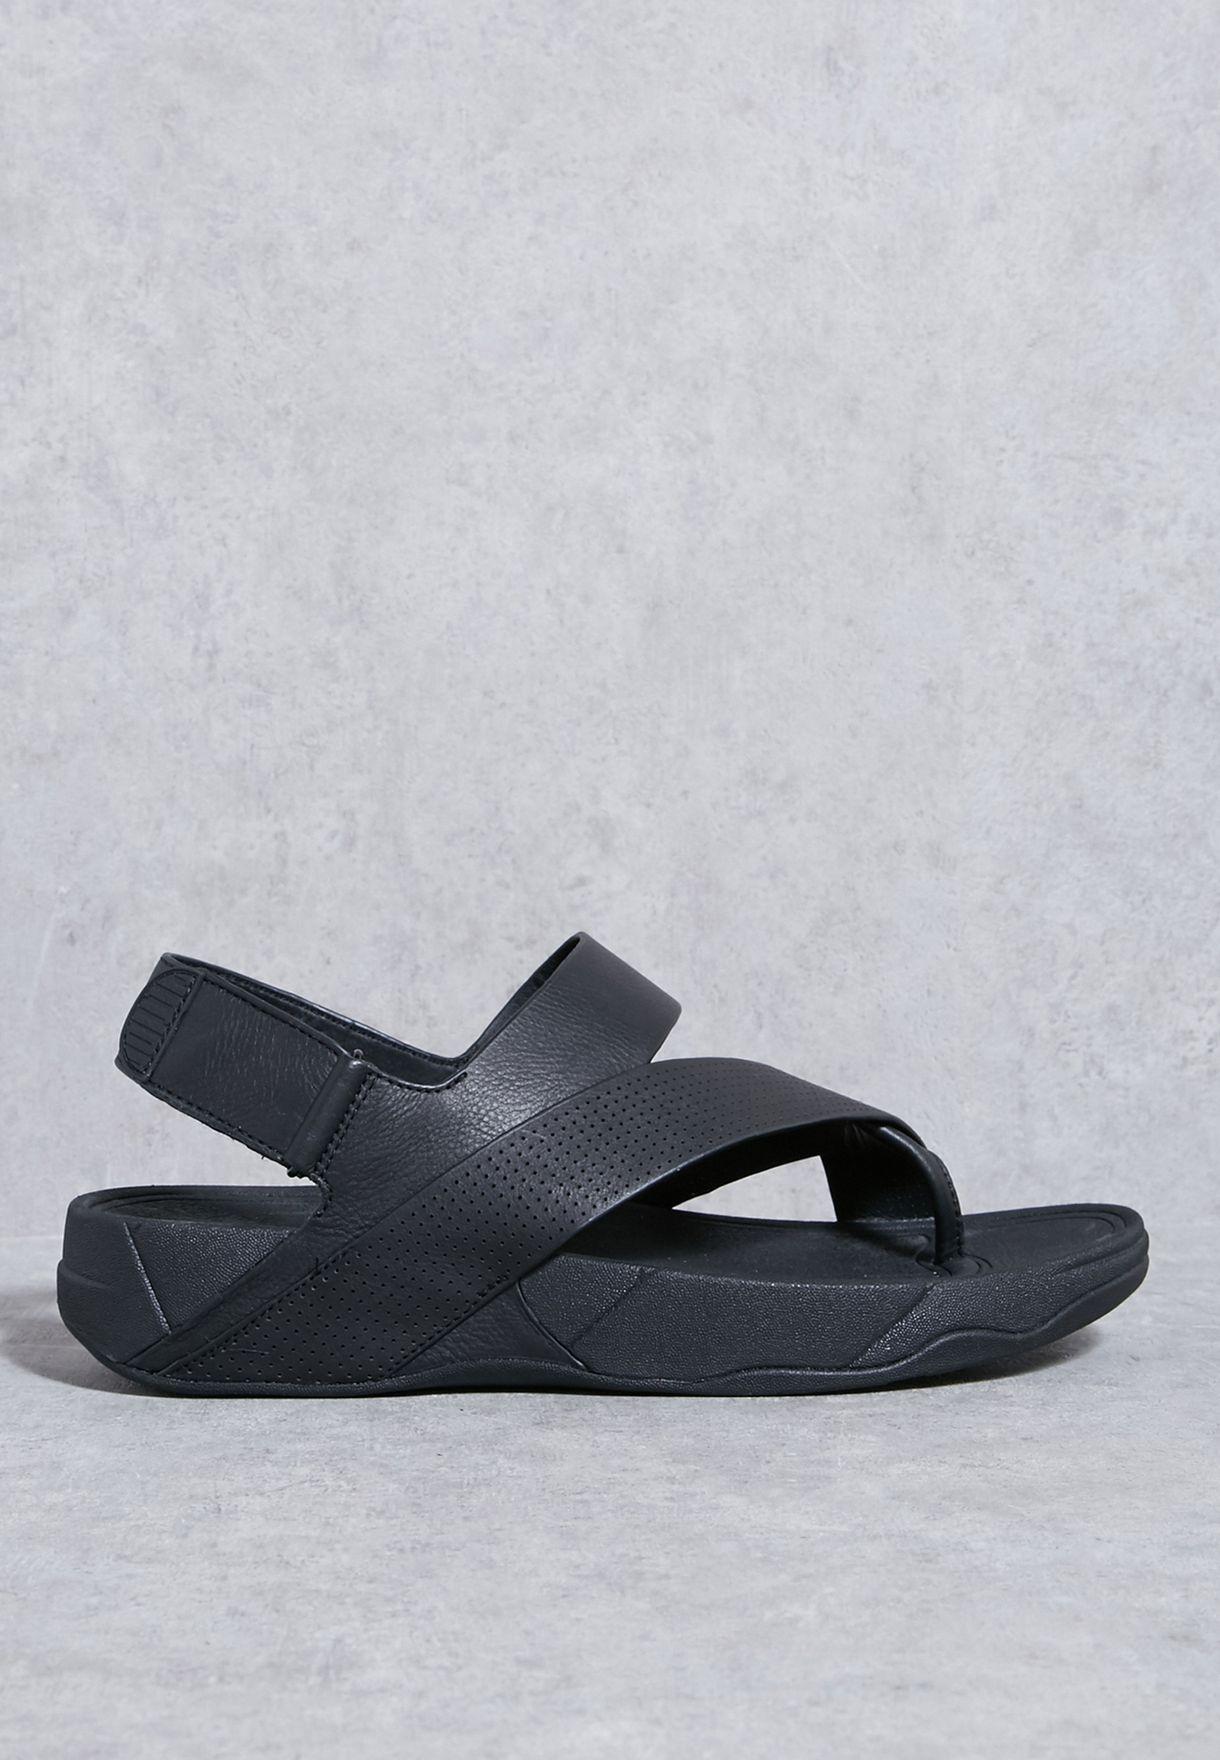 fbfcf95a06ff Shop Fitflop black Sling Perf Sandals H05-090 for Men in UAE ...